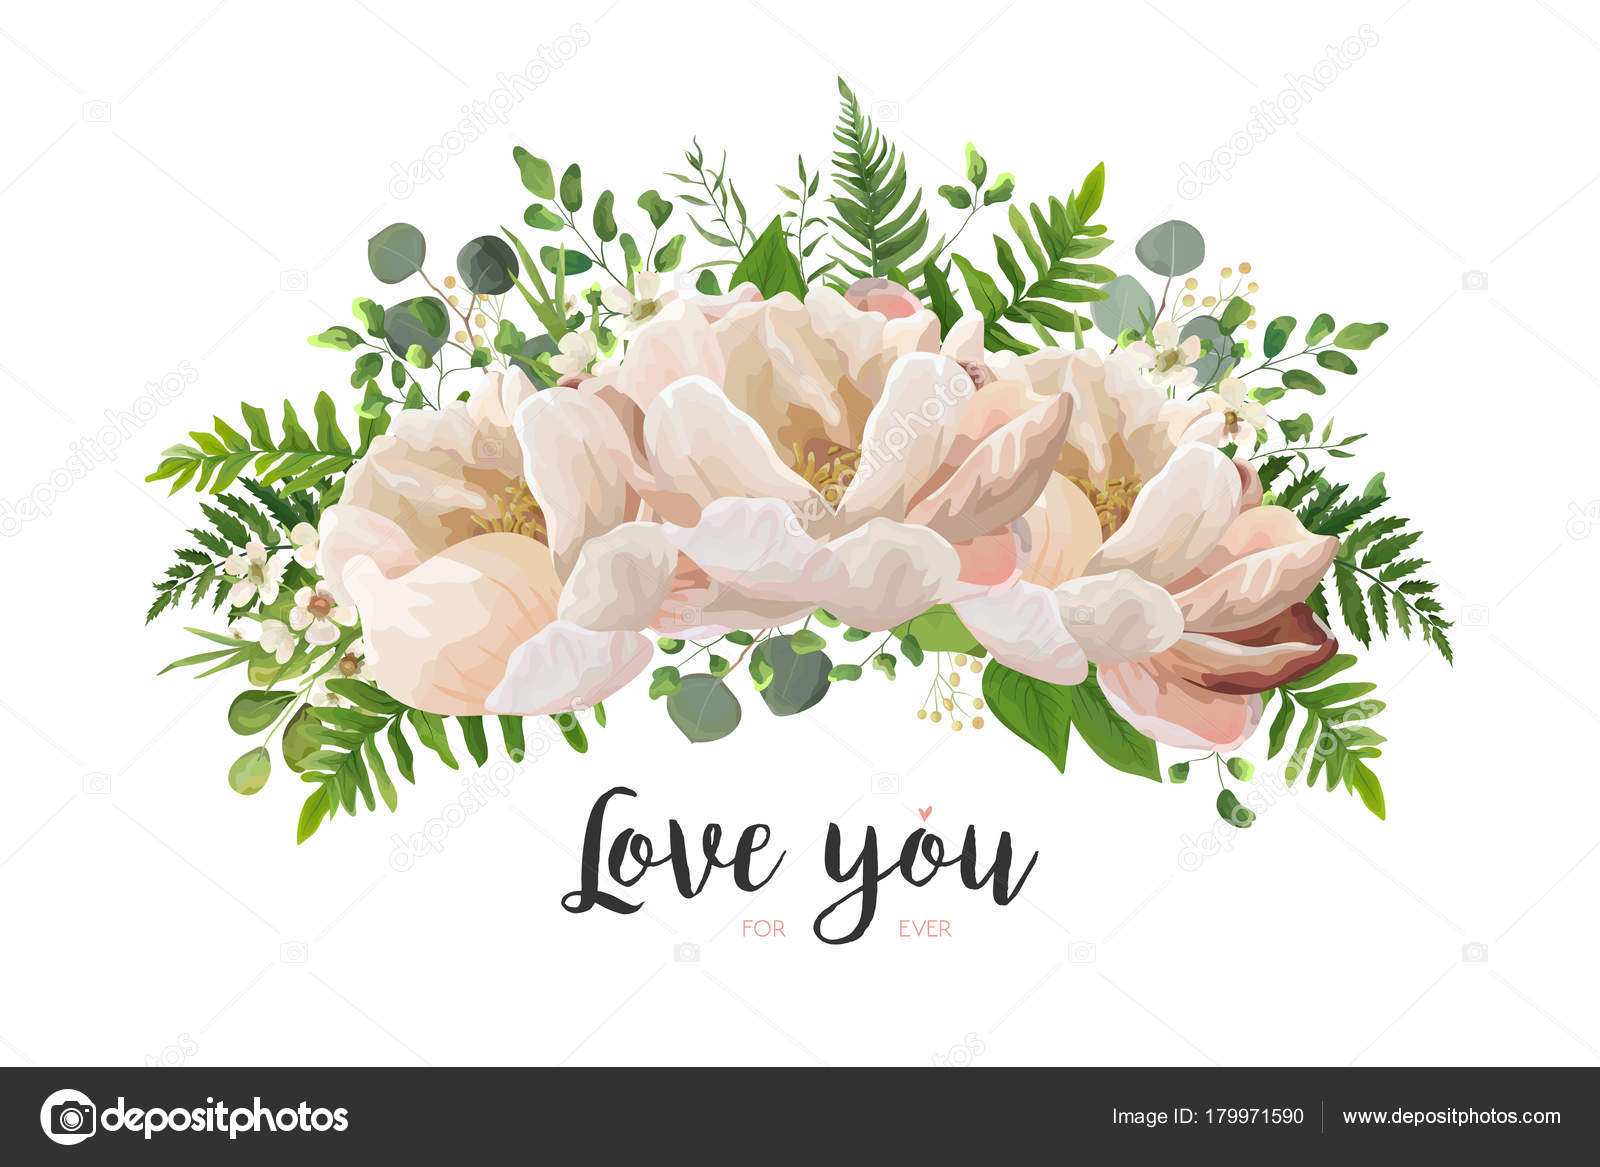 Flower Bouquet vector design element. Peach, pink rose peony, wax ...